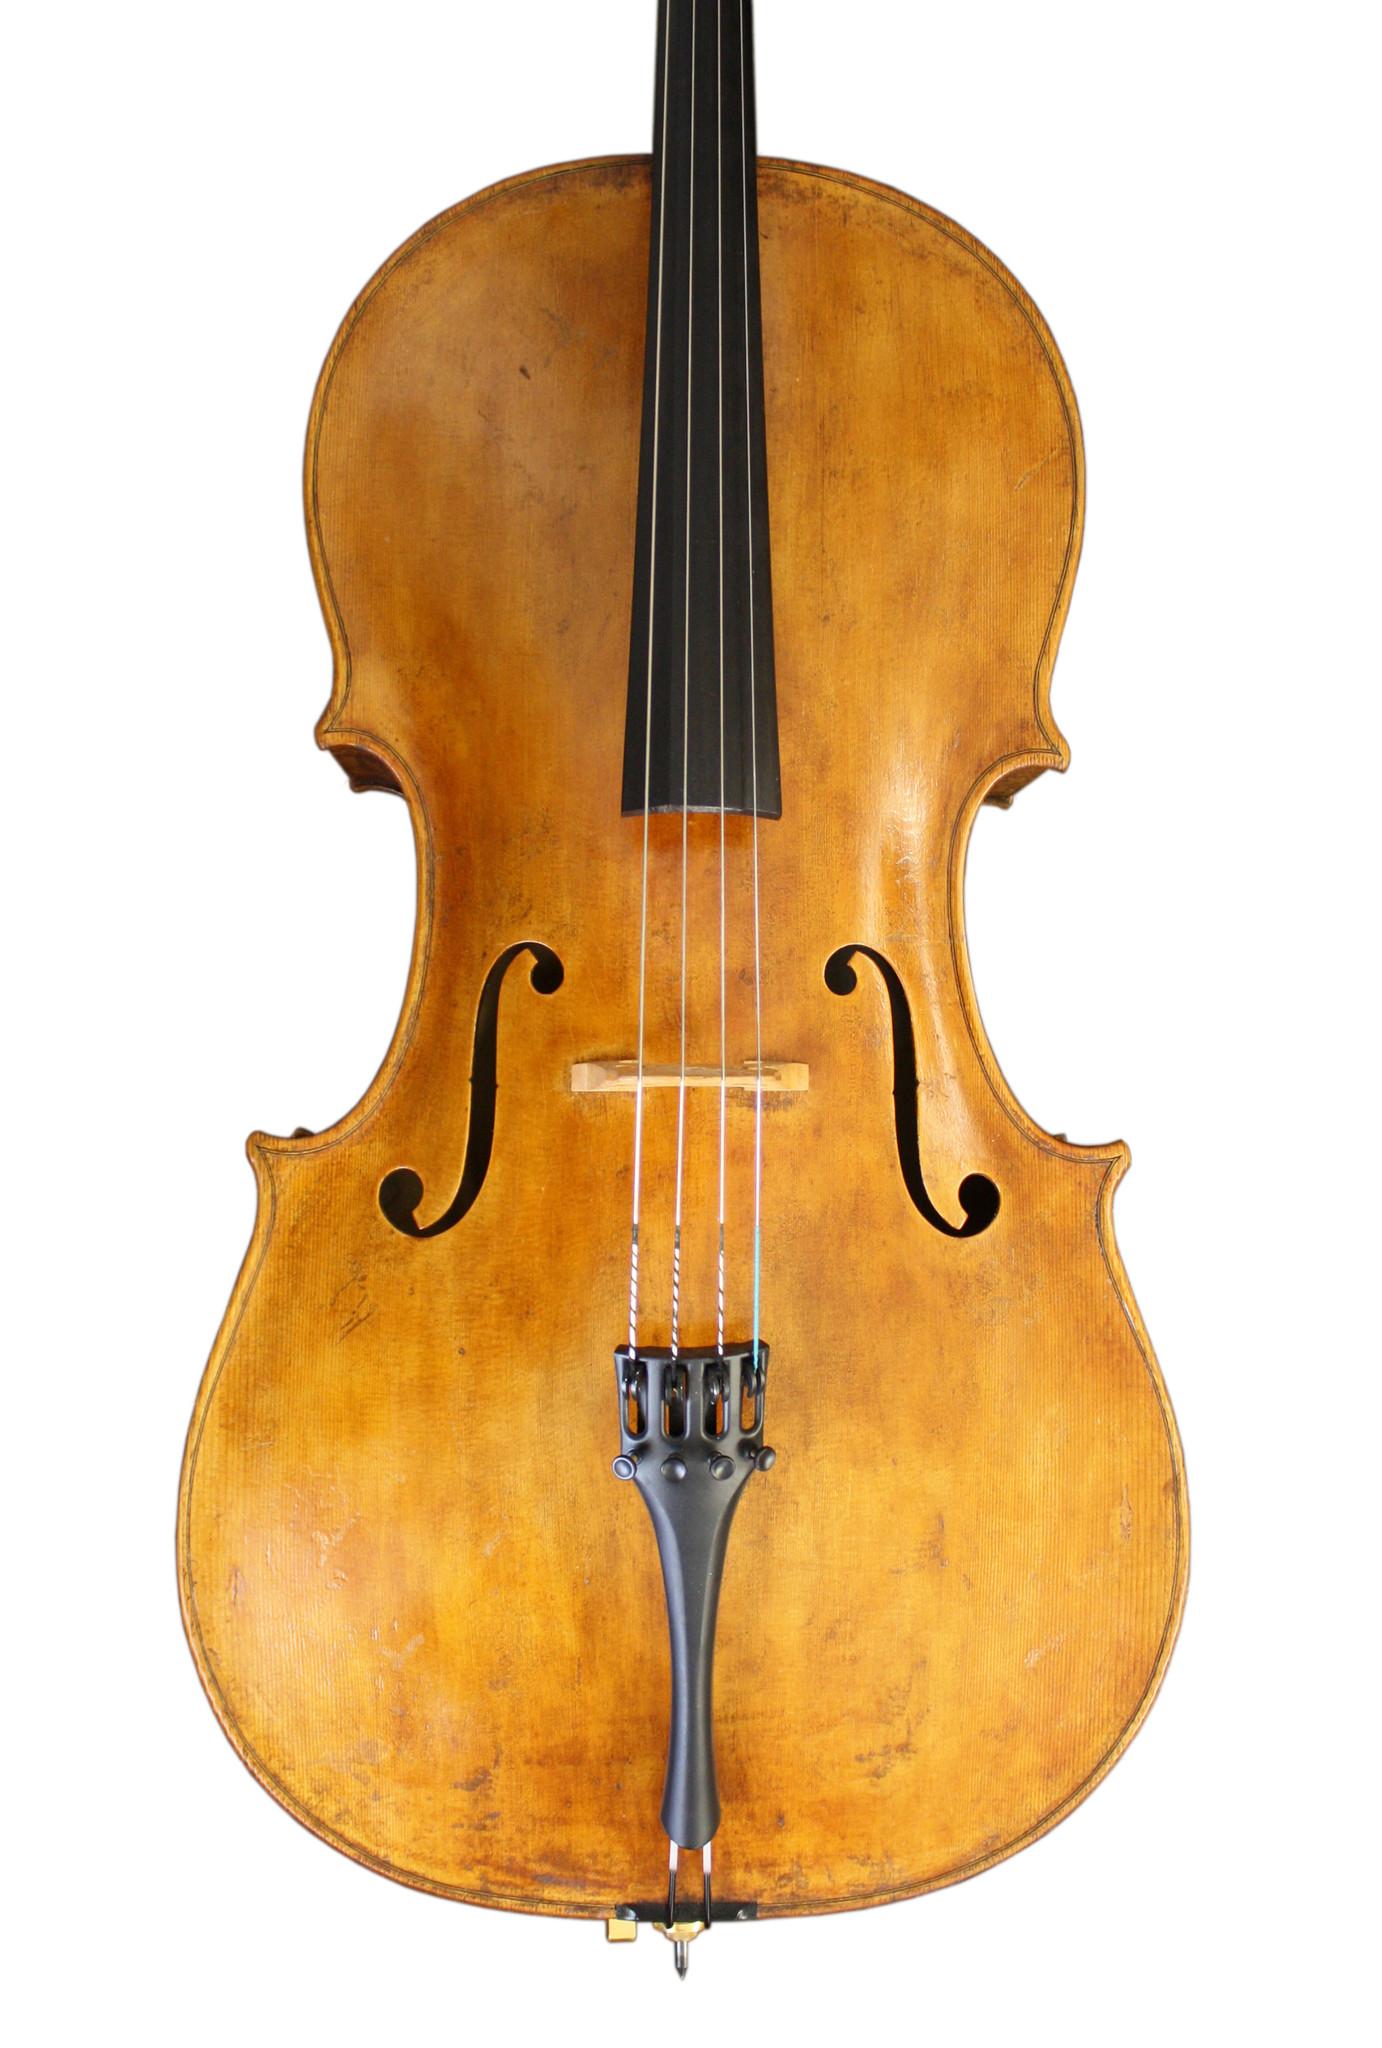 Michael Fischer cello, 2017, Grancino label, Los Angeles